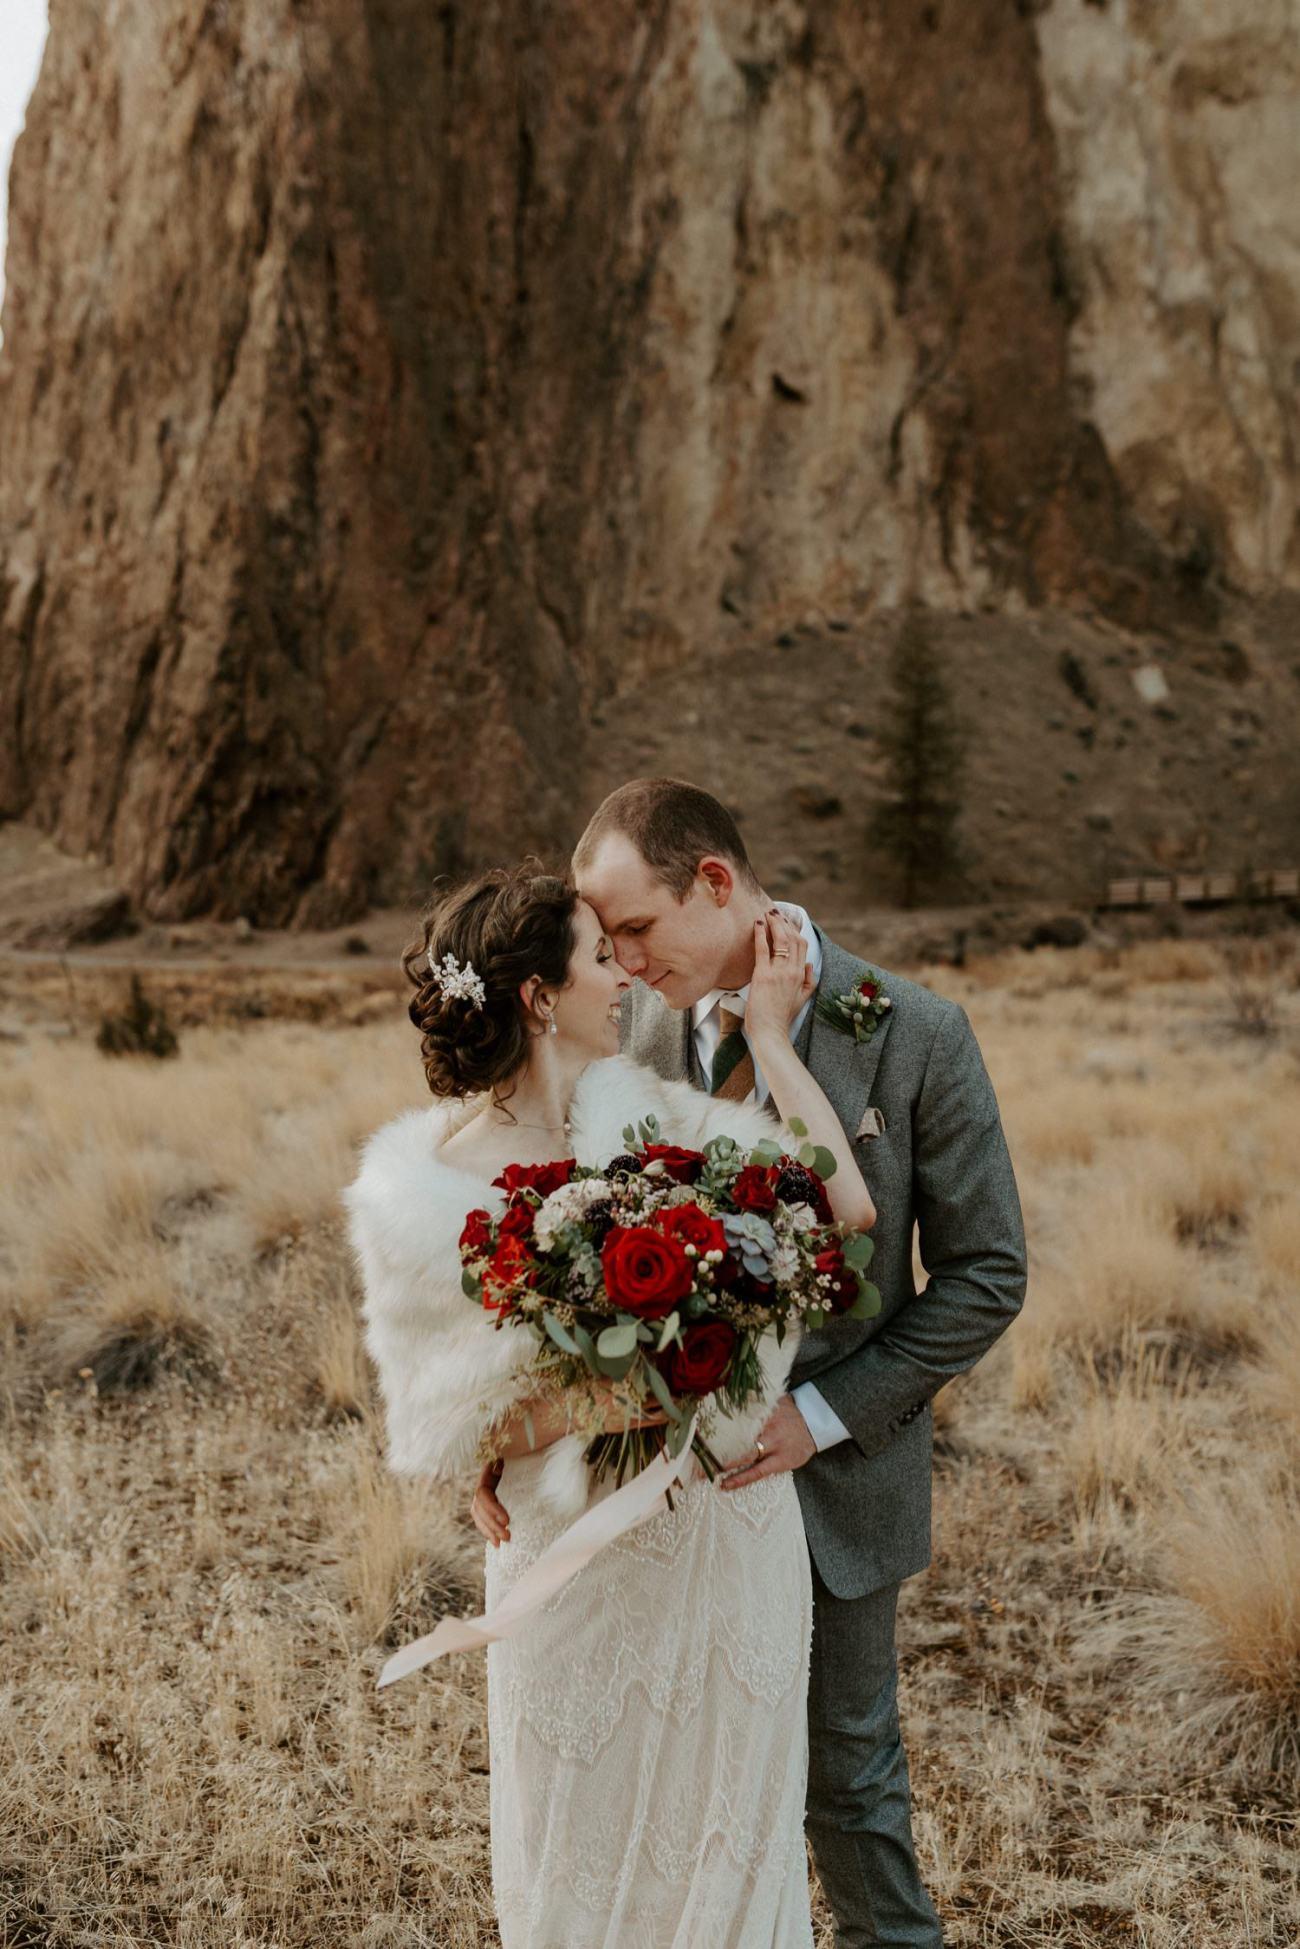 Smith Rock State Park Elopement Bend Oregon Elopement Photographer Anais Possamai Photography 011